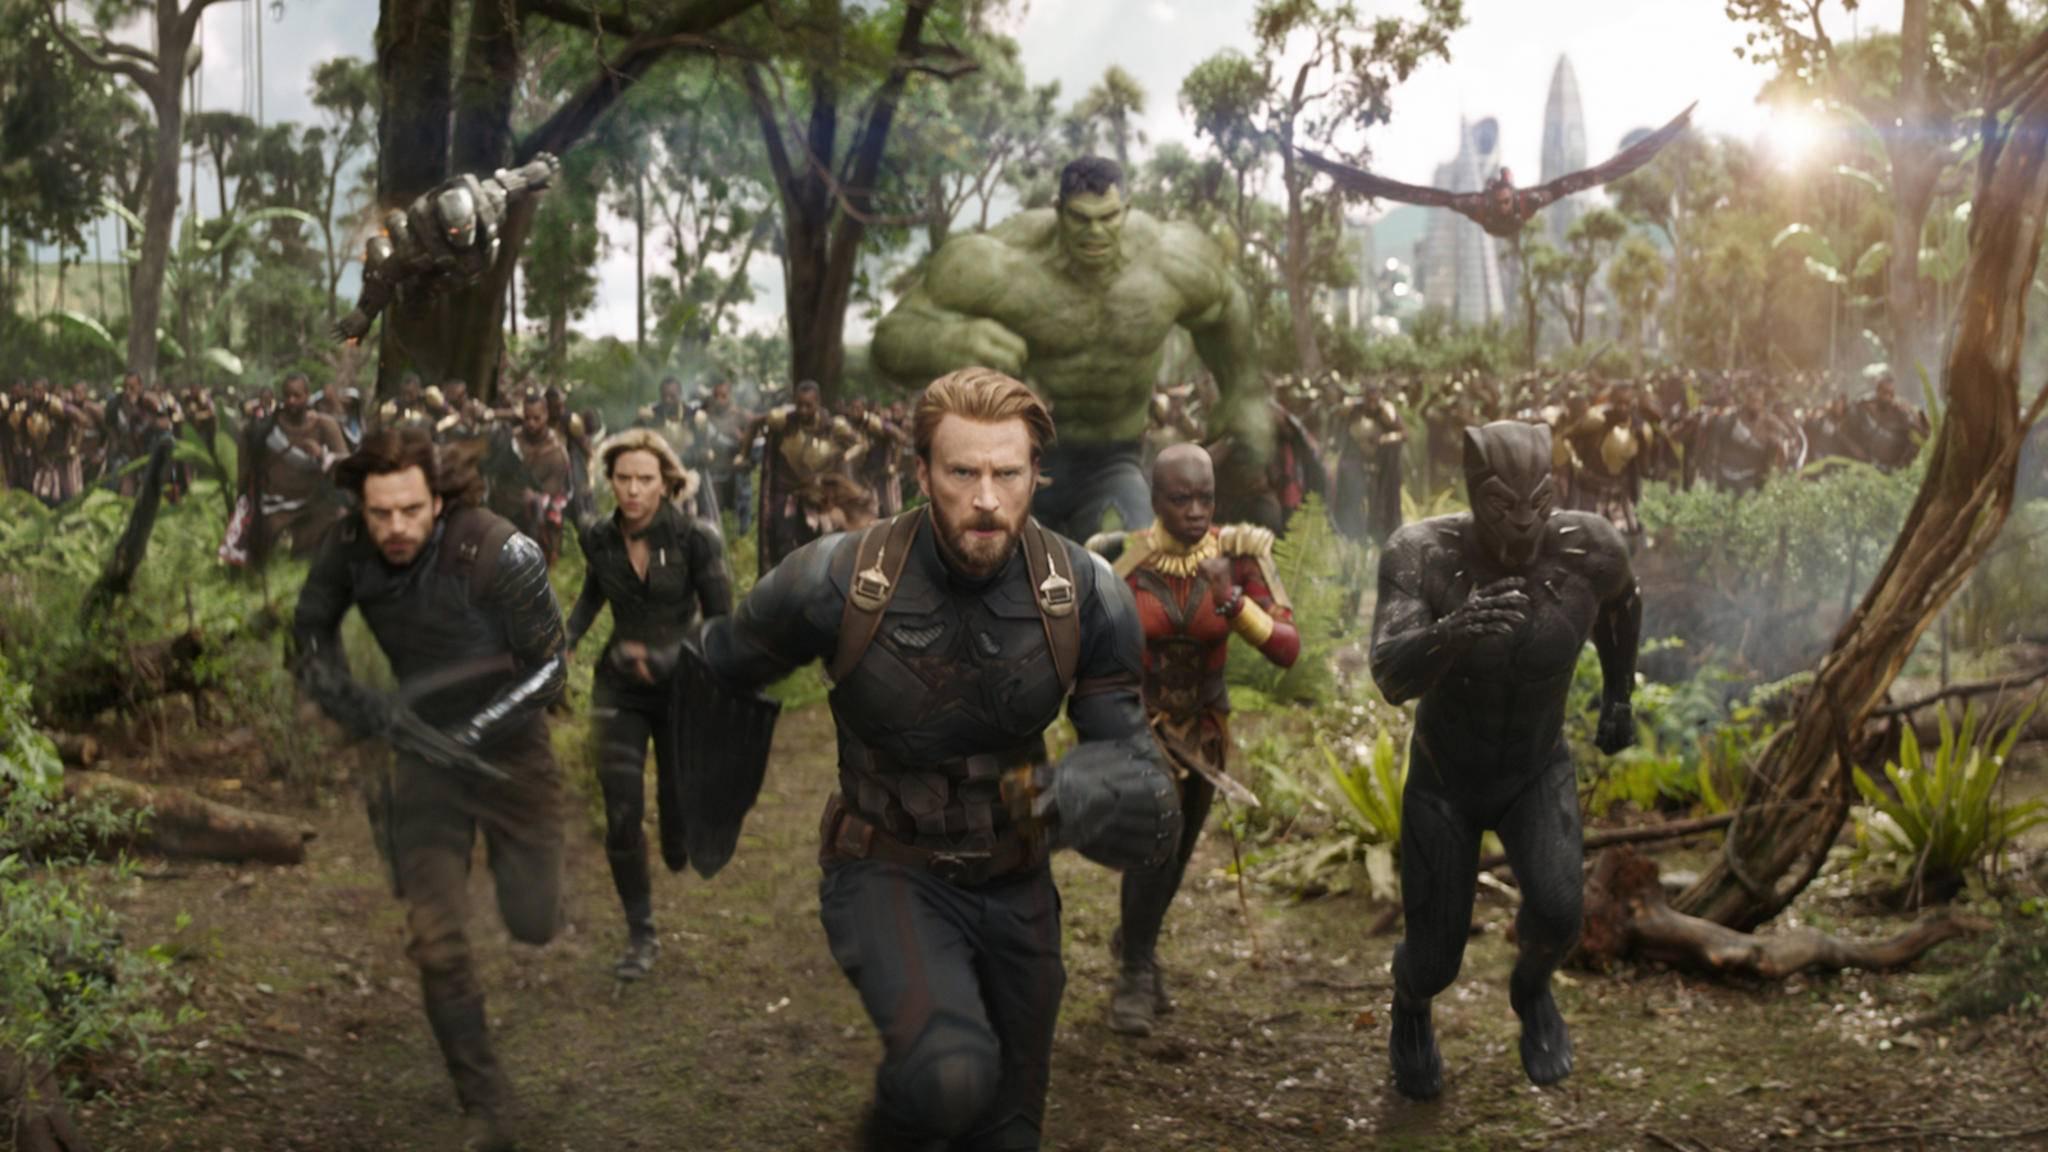 Die Avengers rennen schon dem nächsten Rekord entgegen.